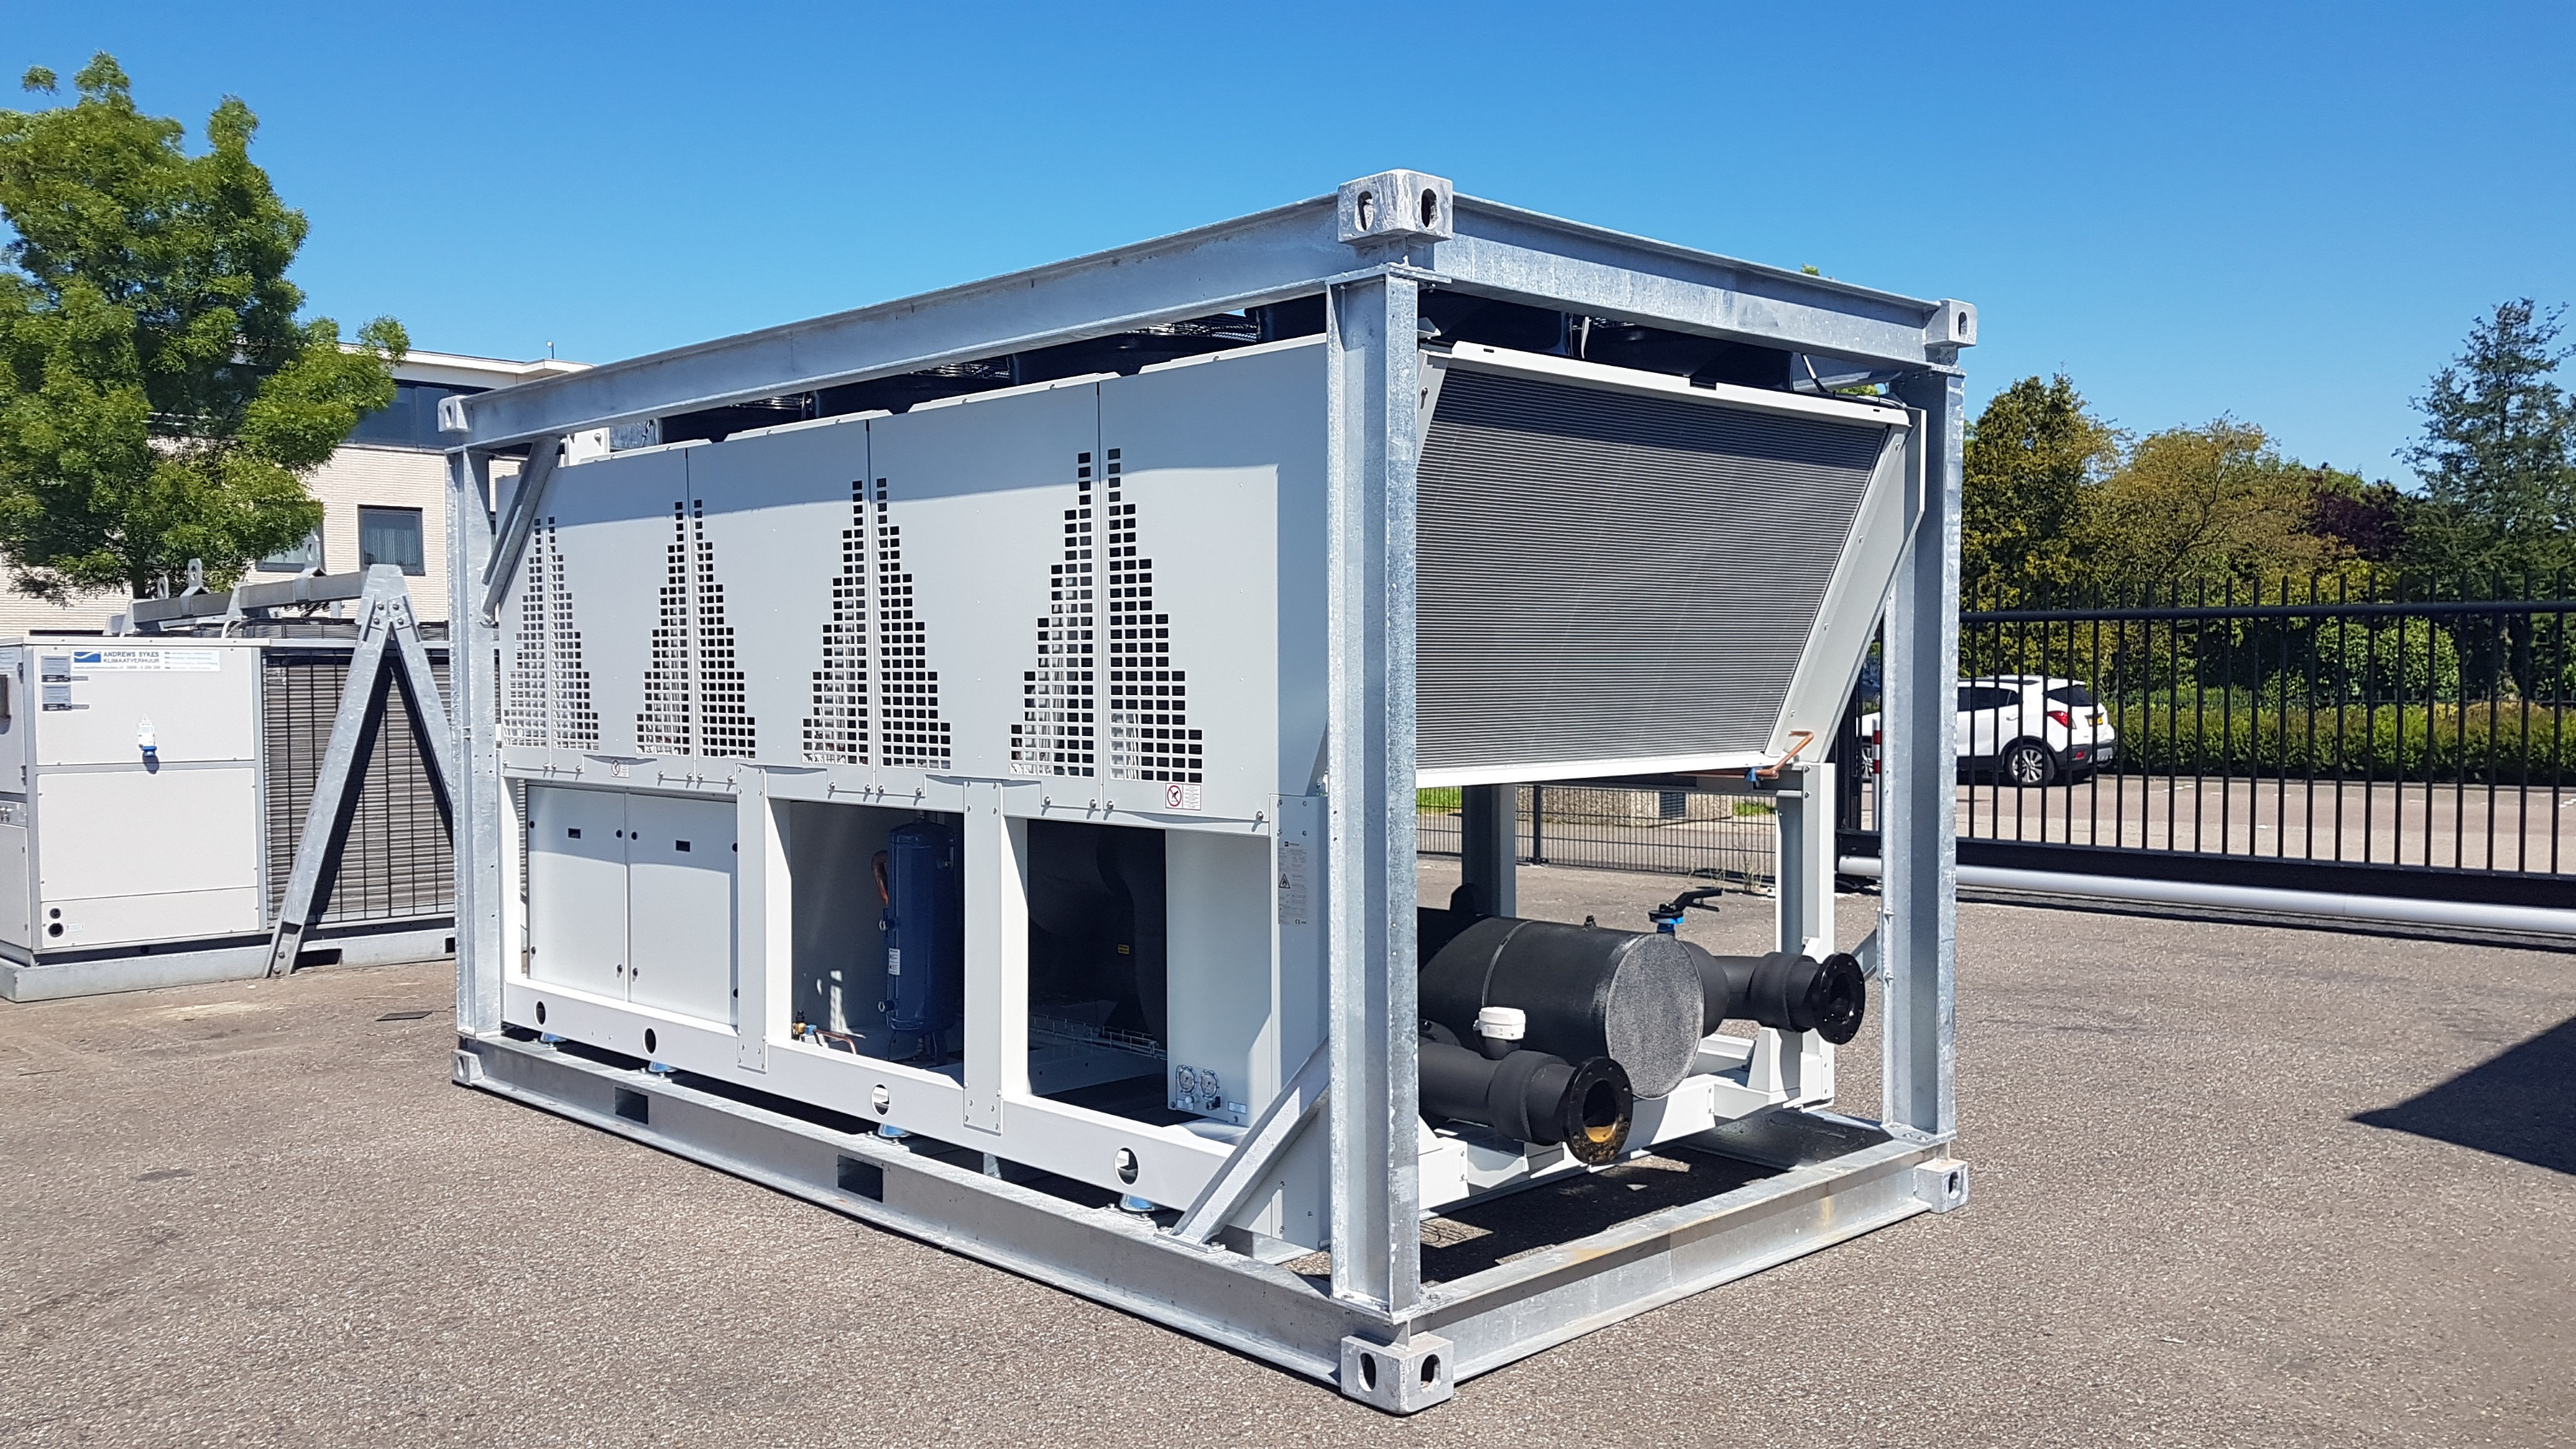 Uitbreiding huurvloot nieuwe serie 500kW chillers